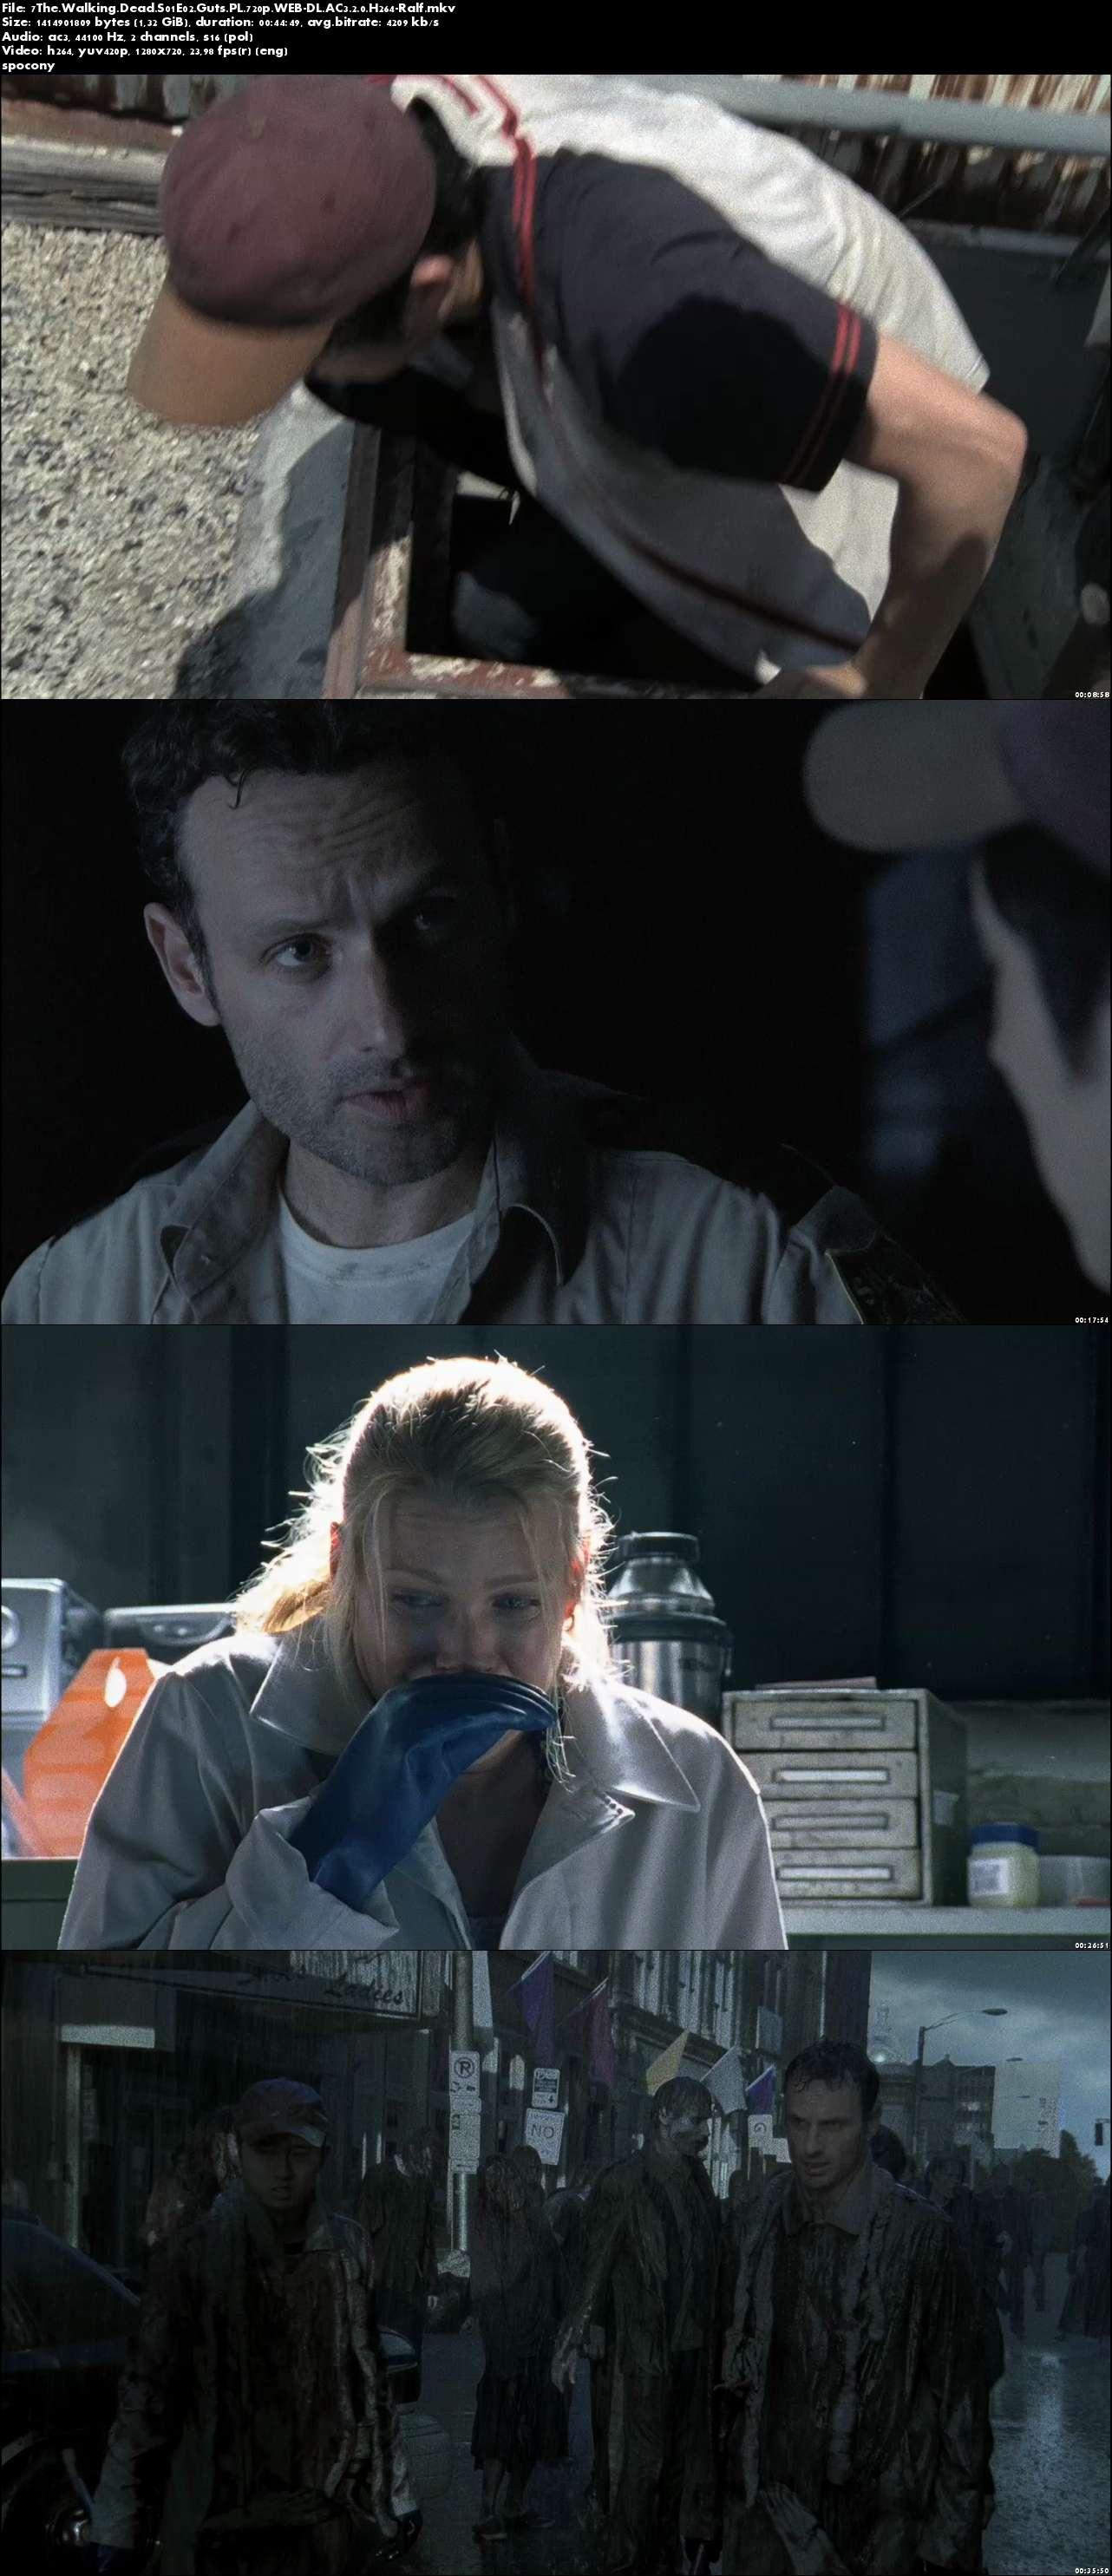 Żywe Trupy / The Walking Dead (2010) {Sezon 1} (Pełen sezon) PL.720p.WEB-DL.AC3.2.0.H264-Ralf [Lektor PL]